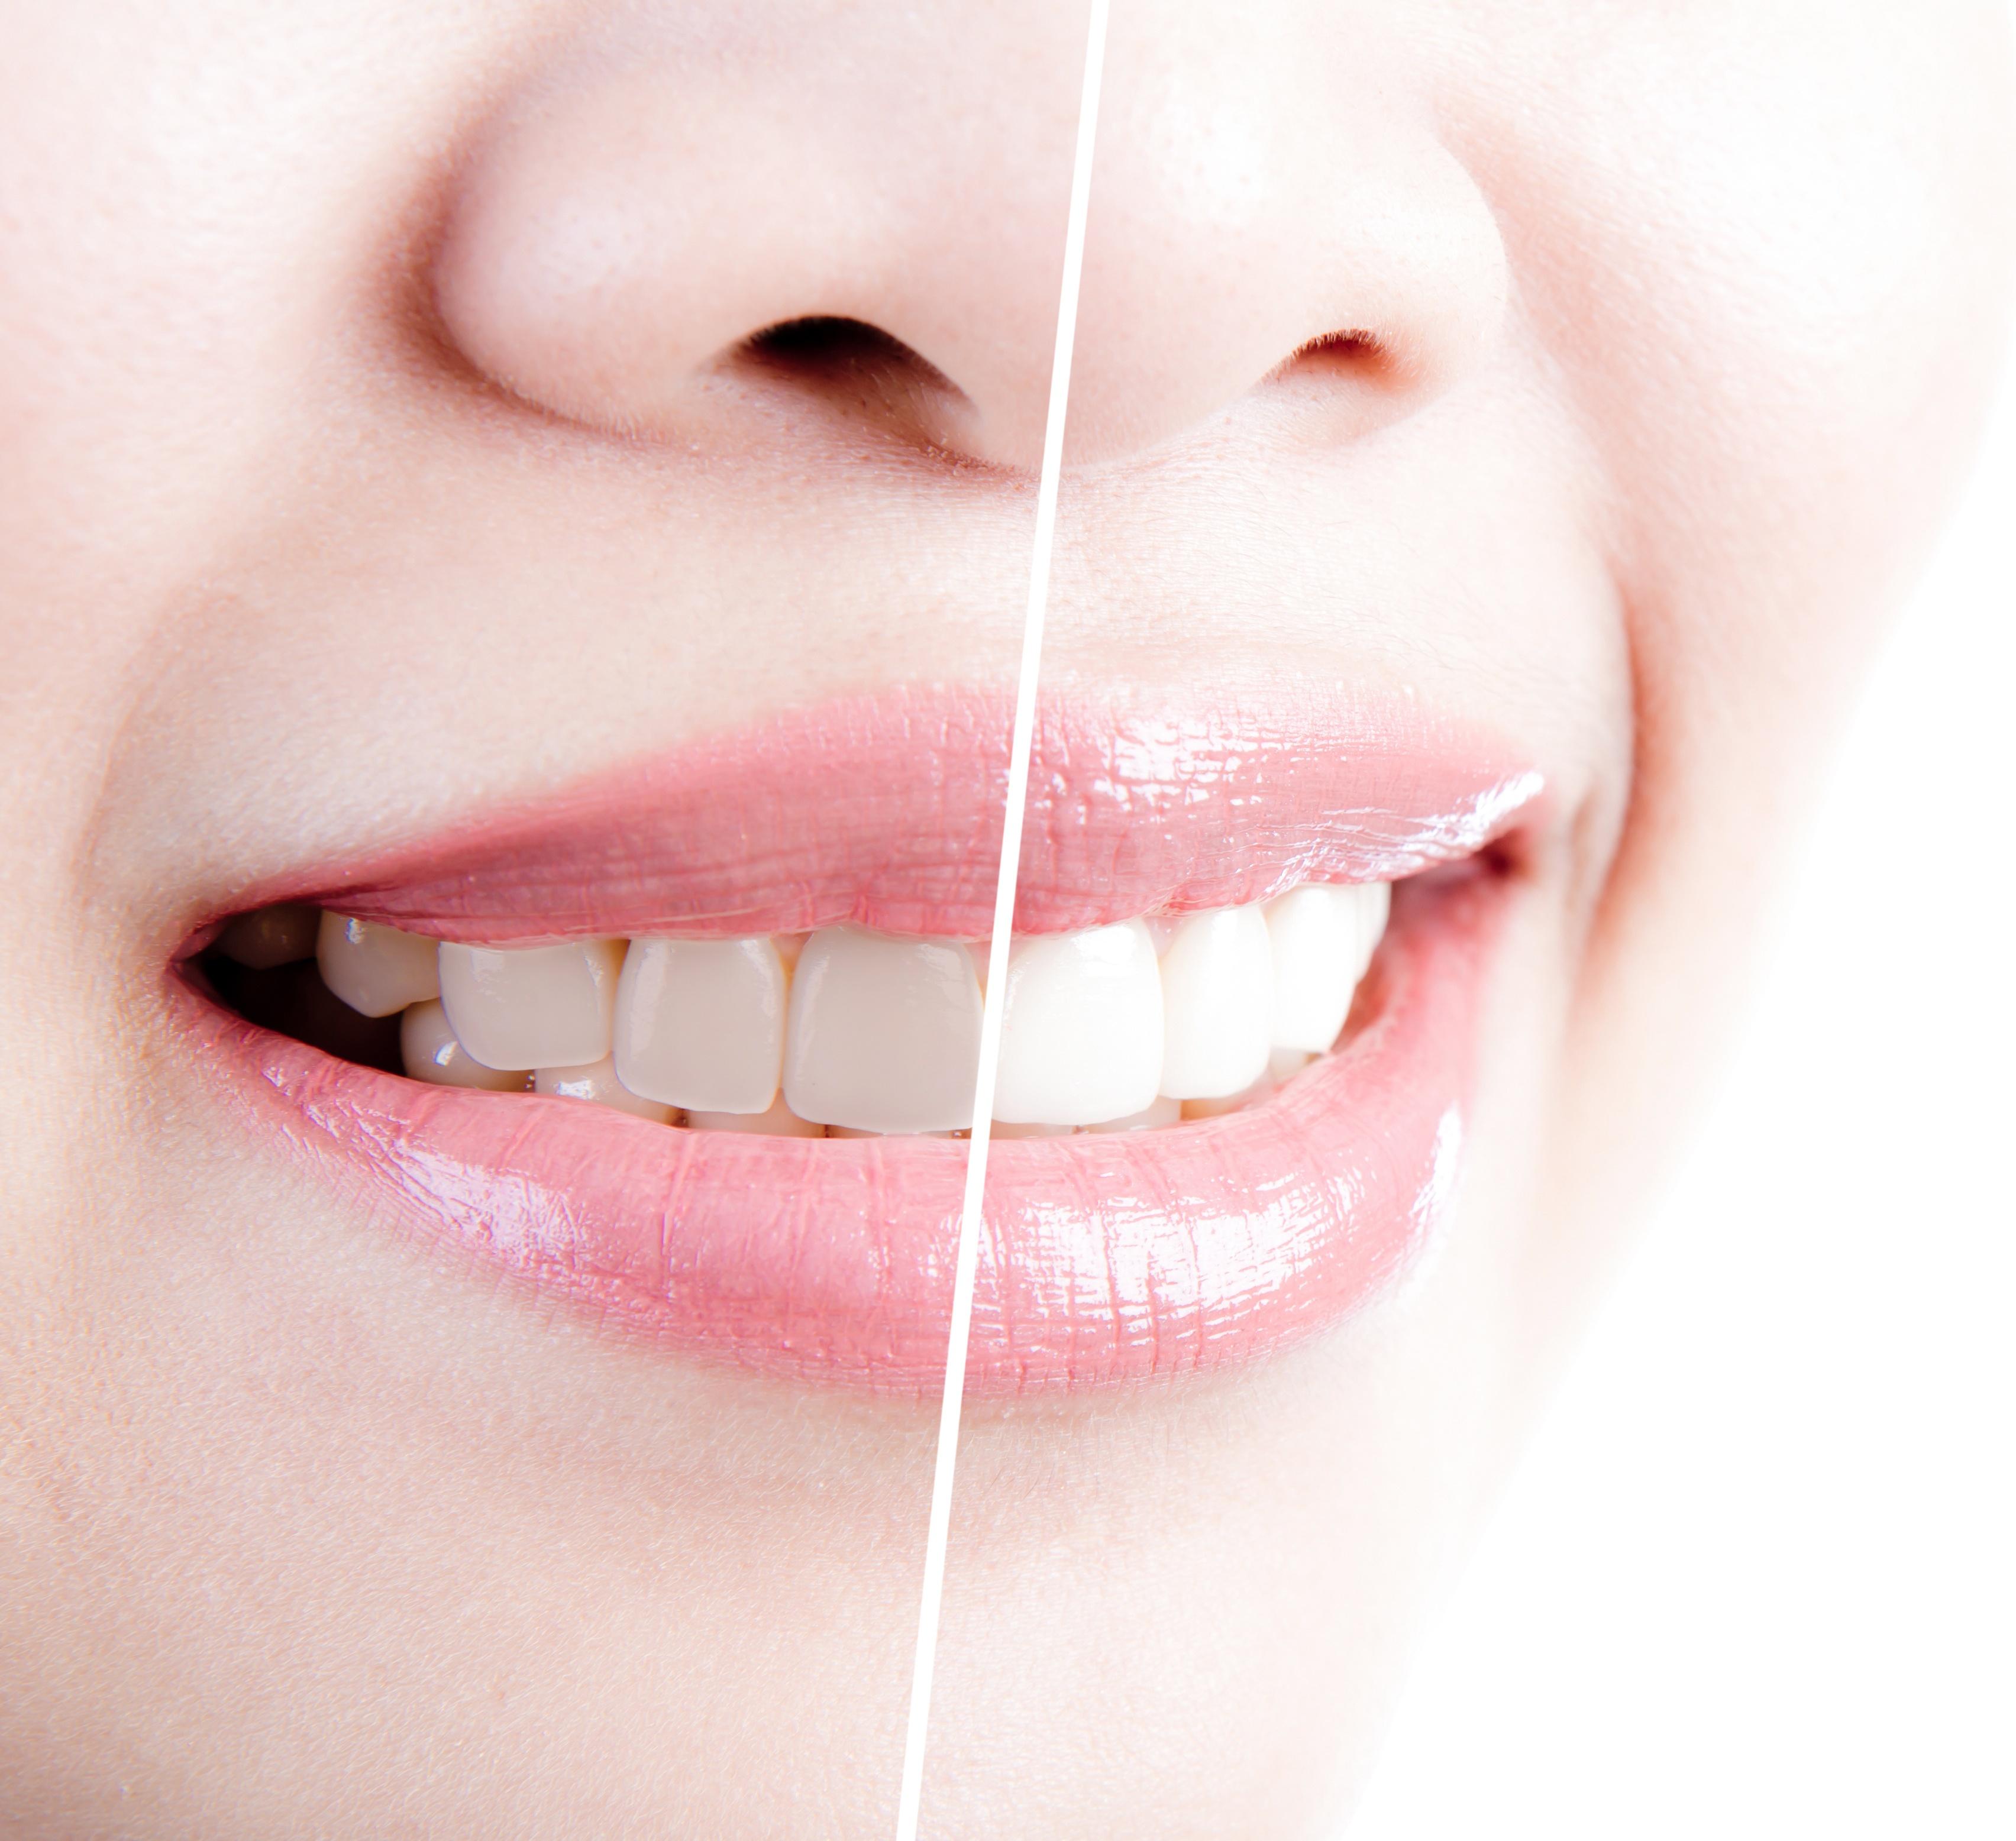 Teeth Whitening in Roselle